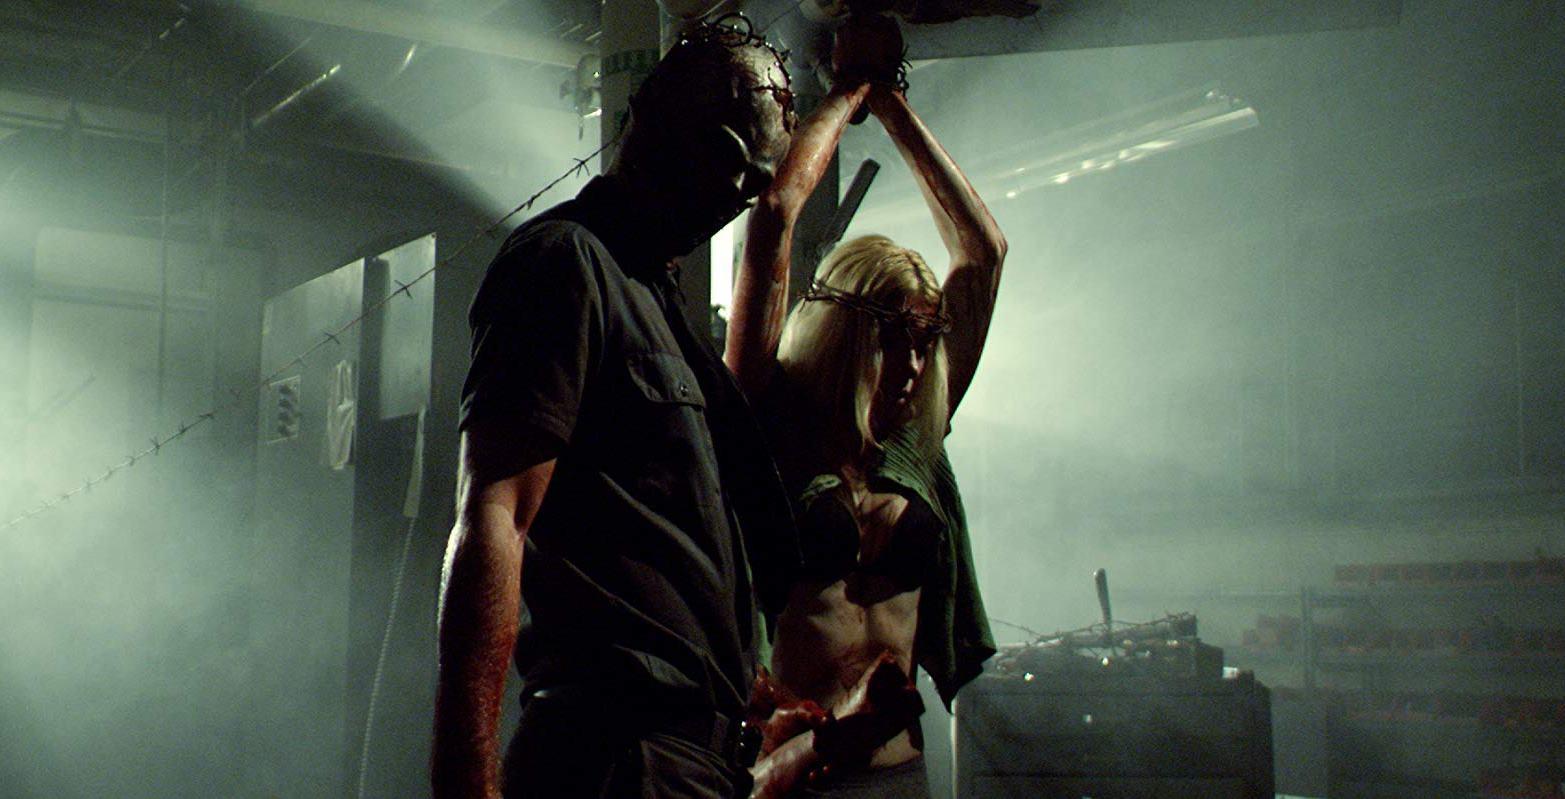 The Orphan Killer (David Backhaus) with heroine Diane Foster a prisoner in The Orphan Killer (2011)